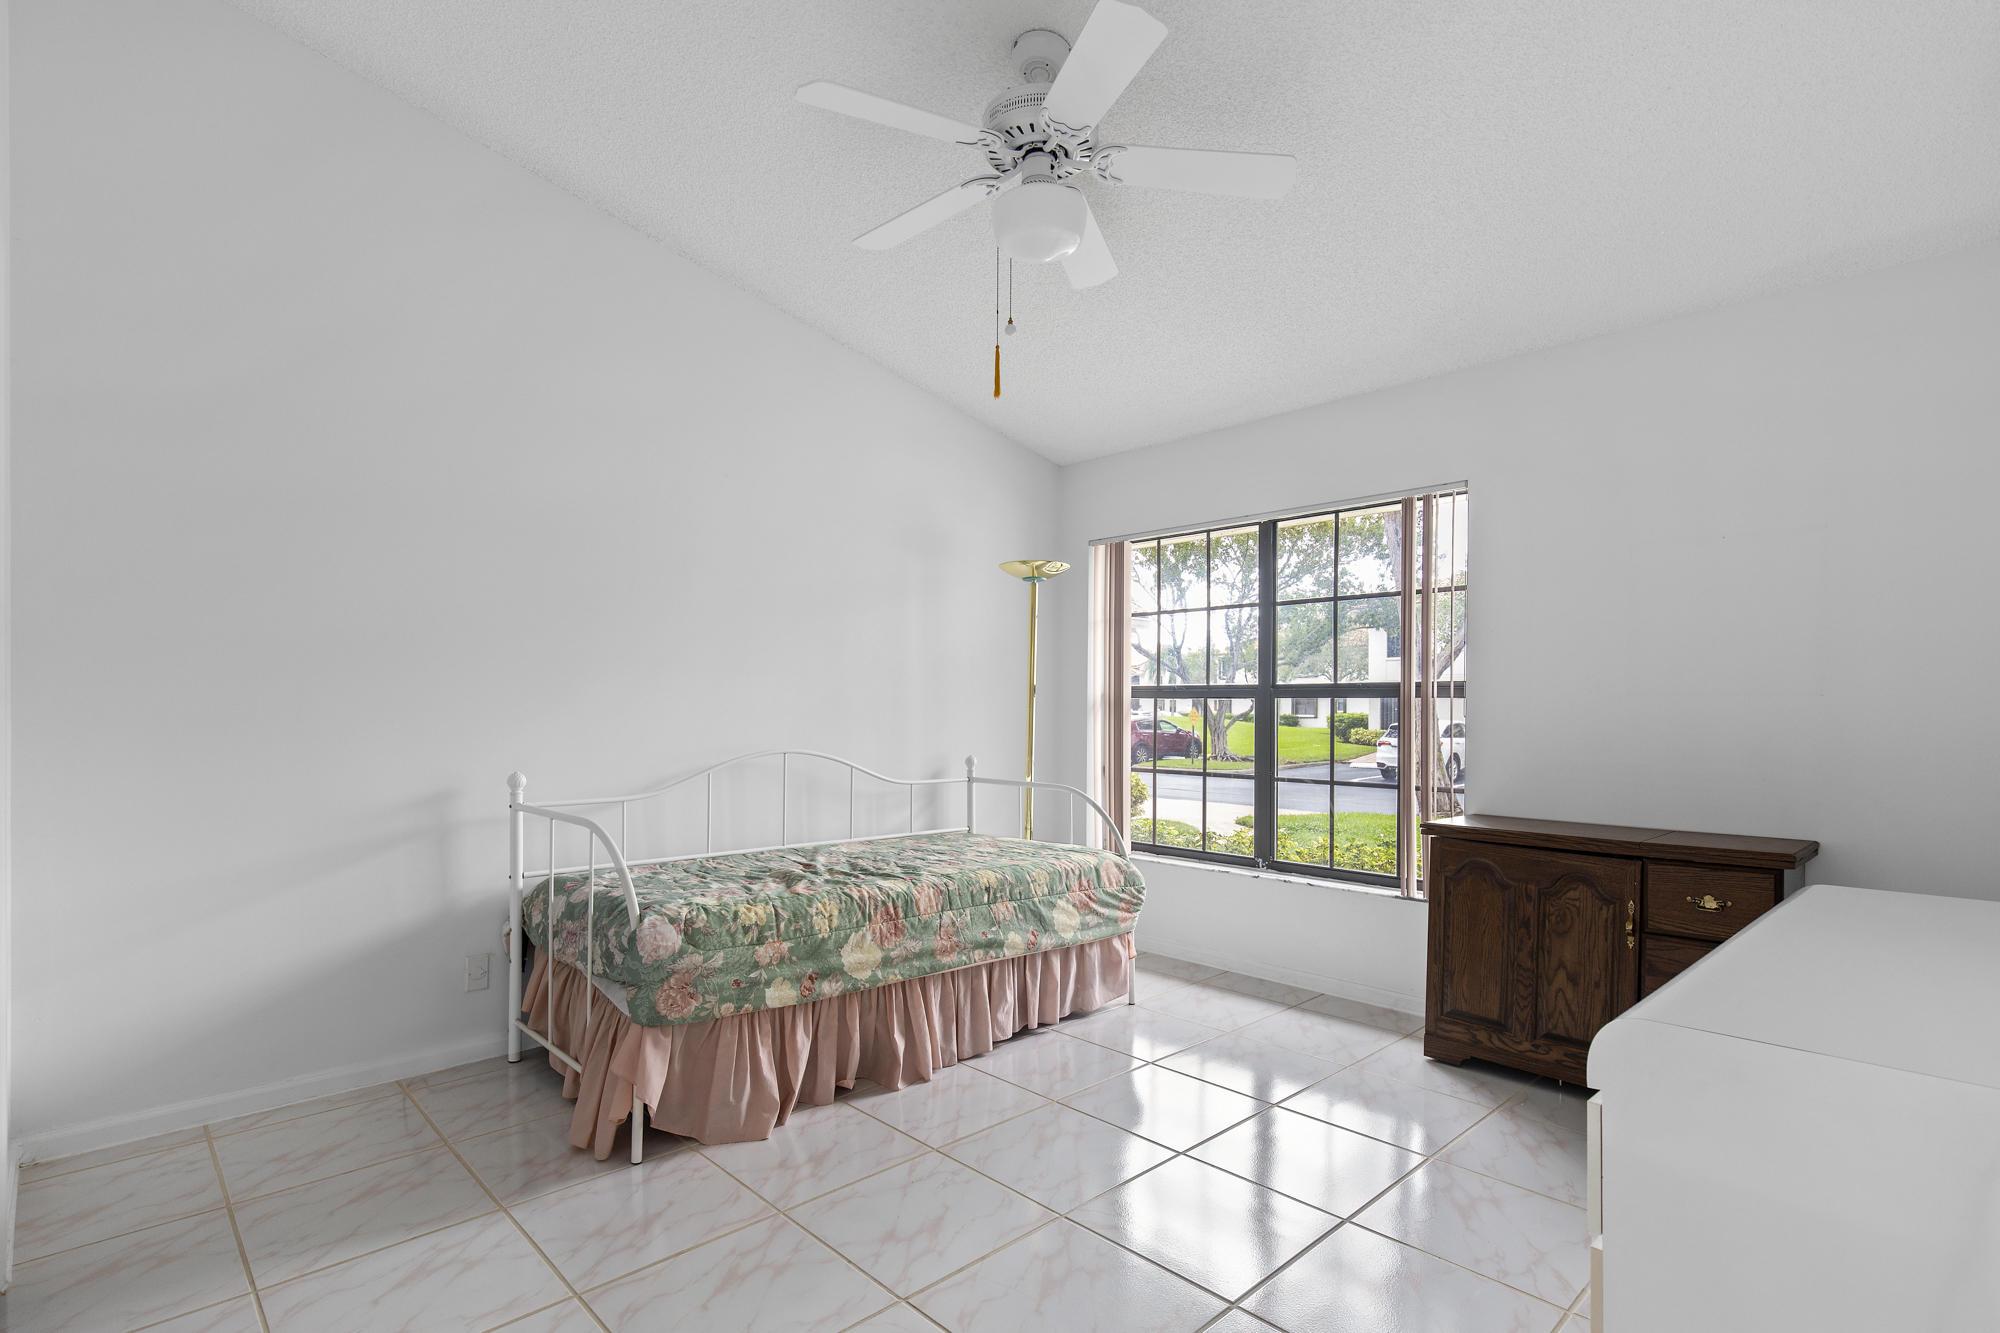 9747 Pavarotti Terrace 102 Boynton Beach, FL 33437 photo 15